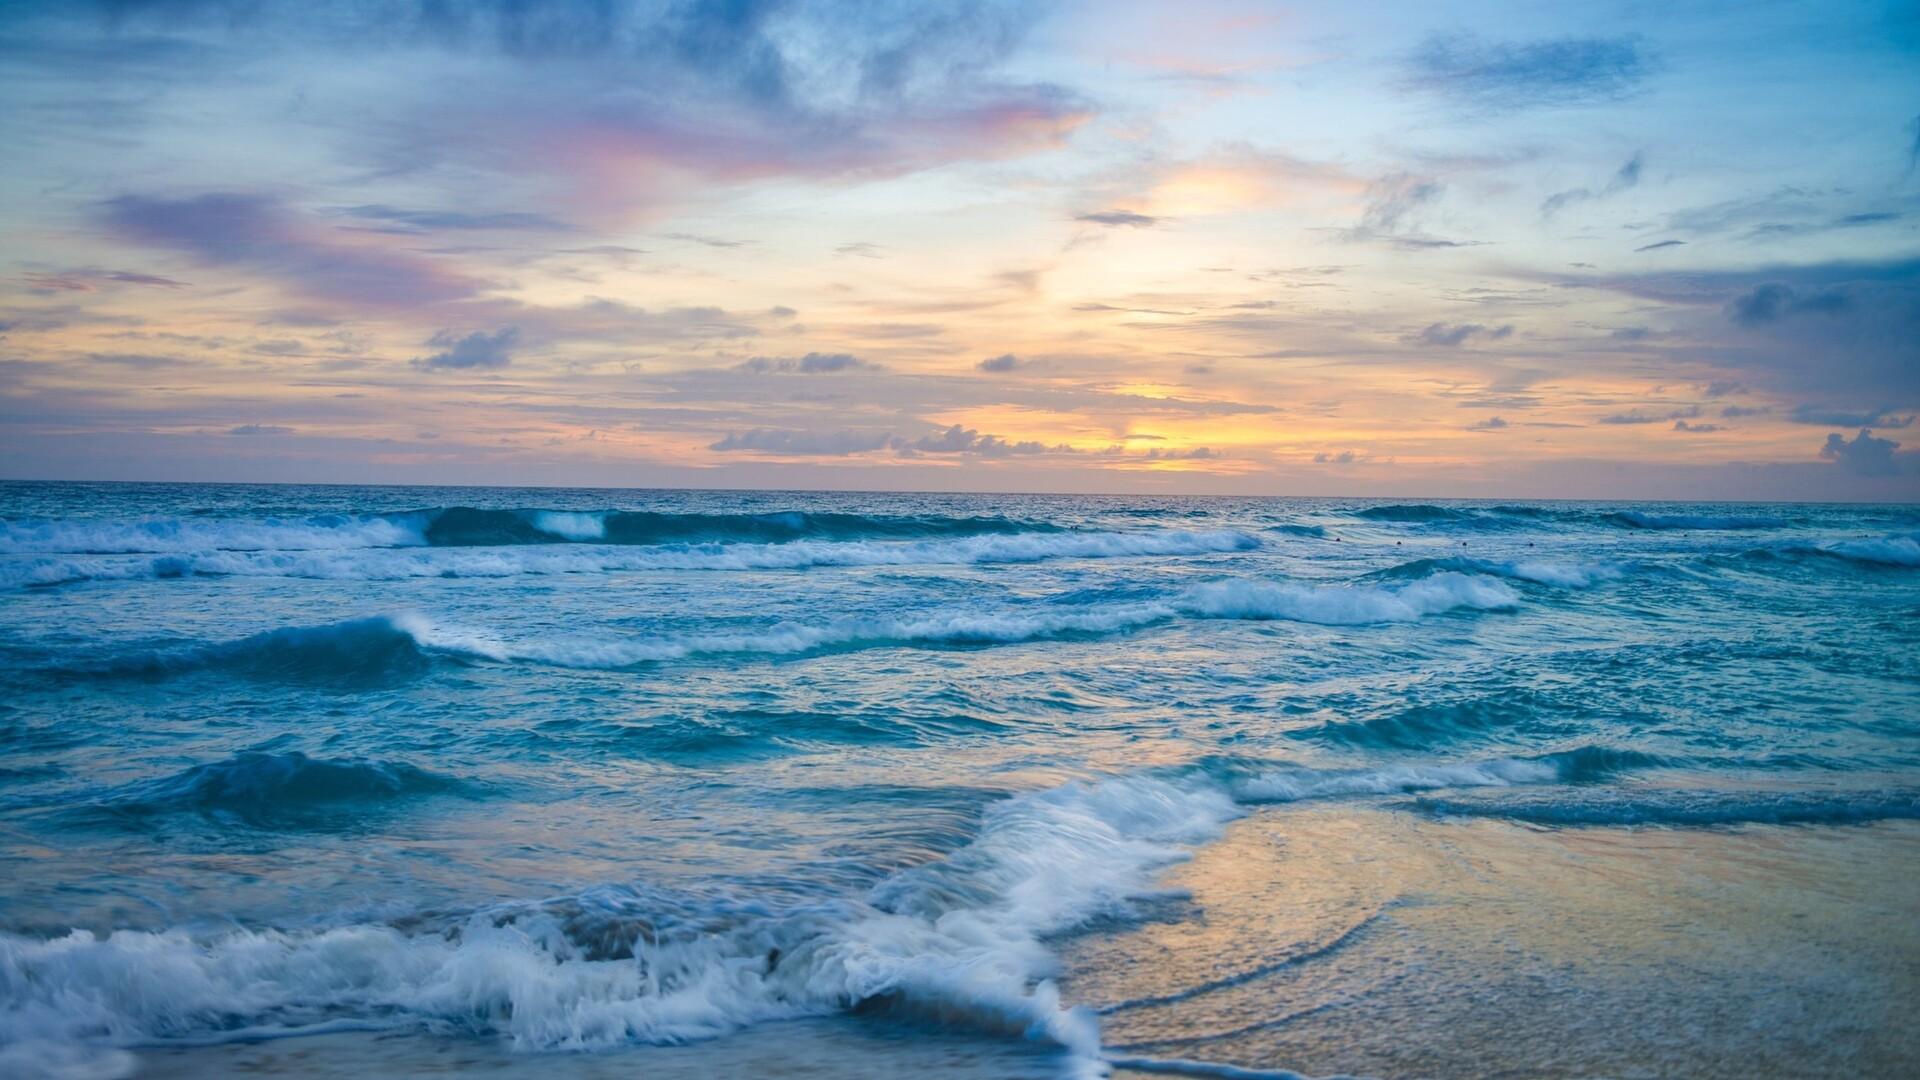 ocean-waves-at-sunset.jpg